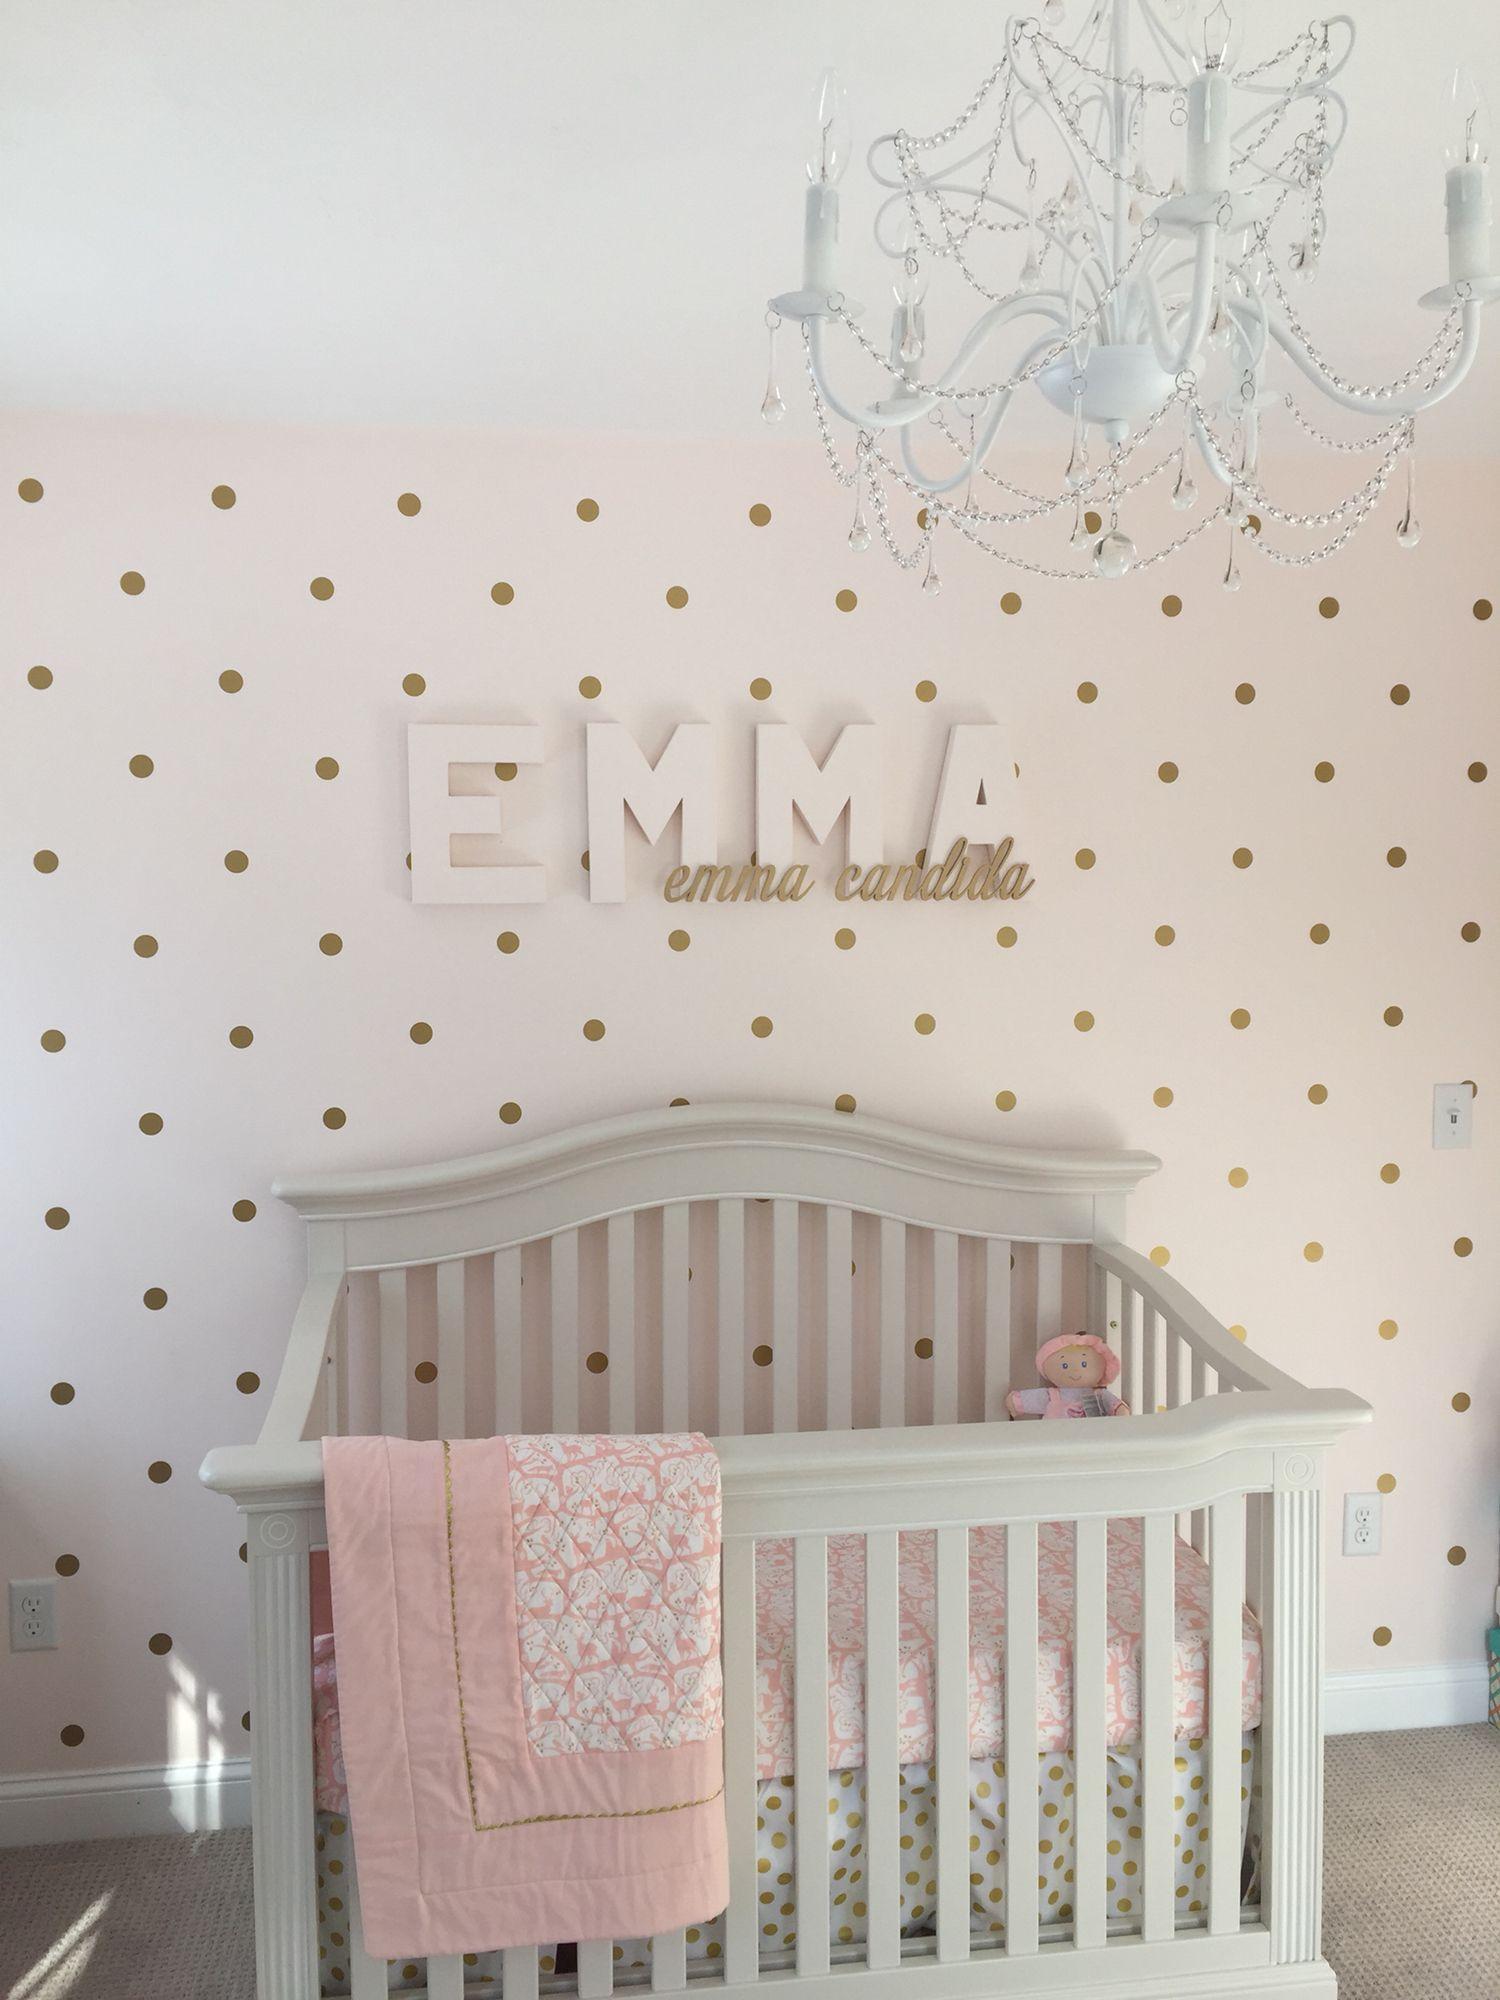 baby girl room chandelier. Baby Girl Nursery. Name Over The Crib. Bridal Pink Benjamin Moore Wall Color. RoomsChandeliersBaby Room Chandelier C